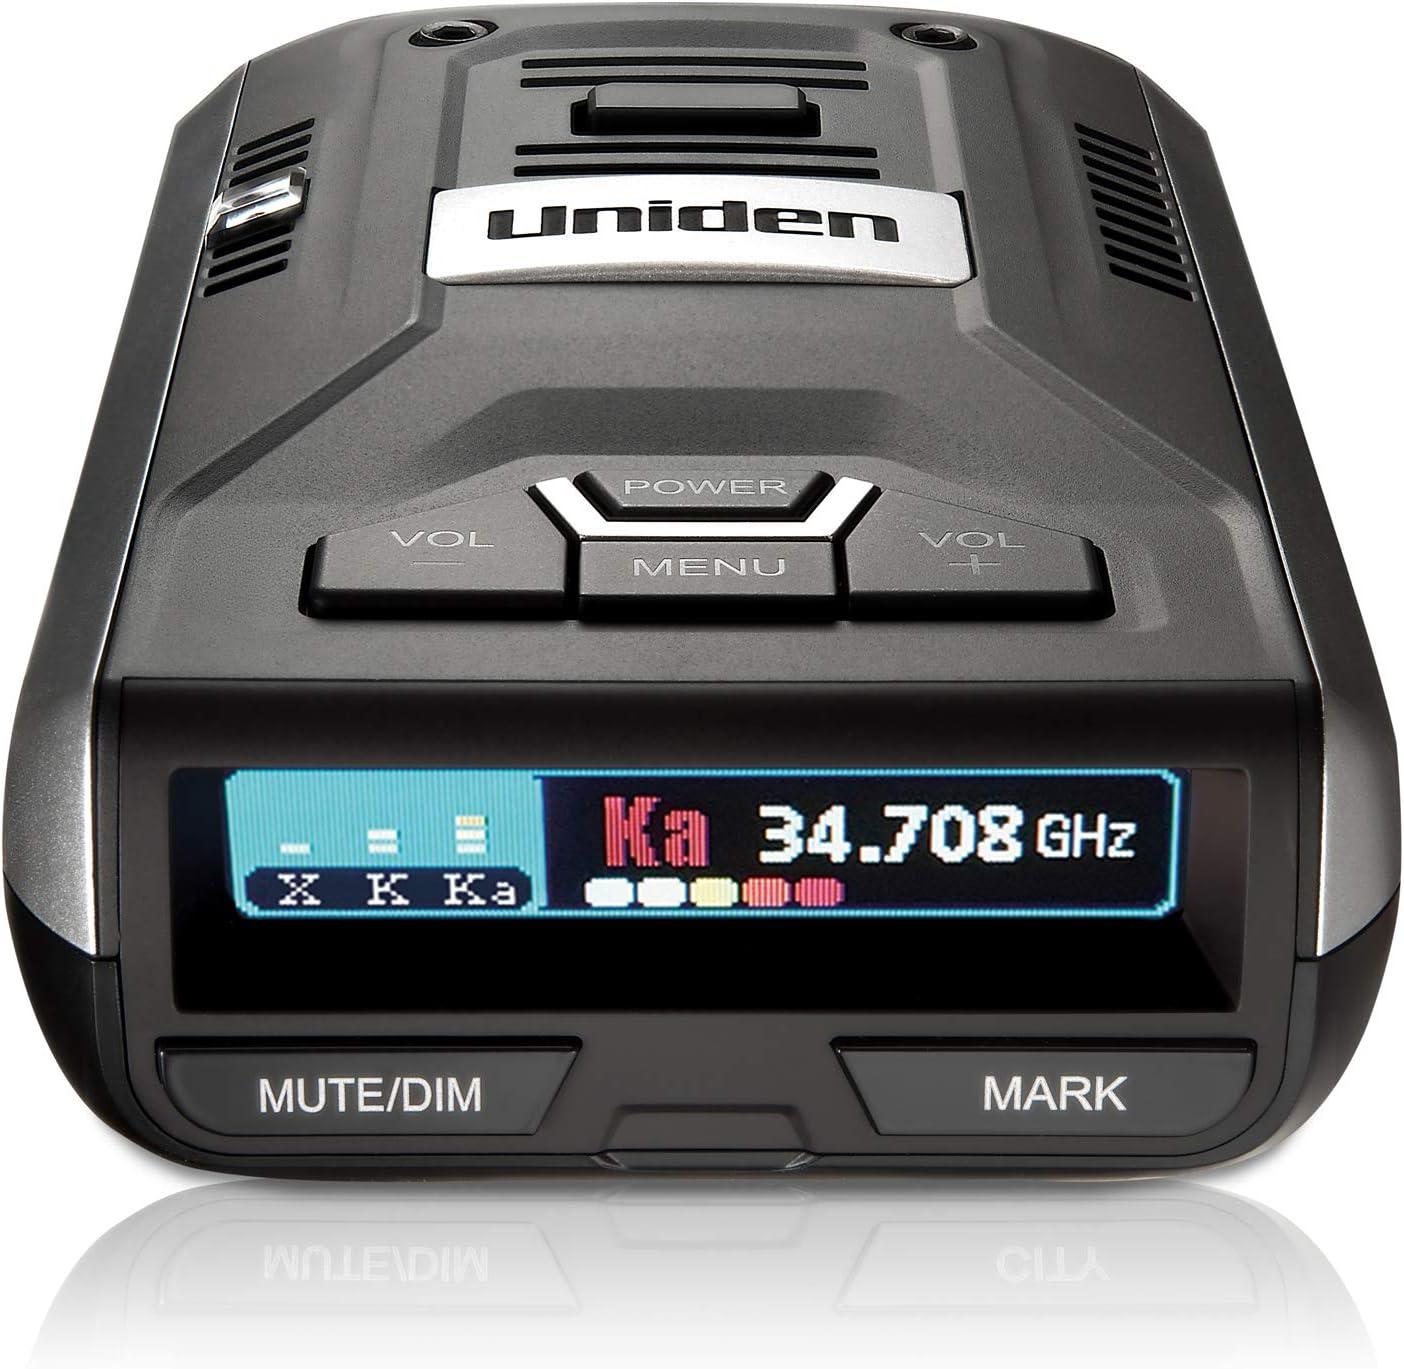 Uniden R3 Extreme Long Range Radar Laser Detector GPS, DSP, Voice Alert, Silver